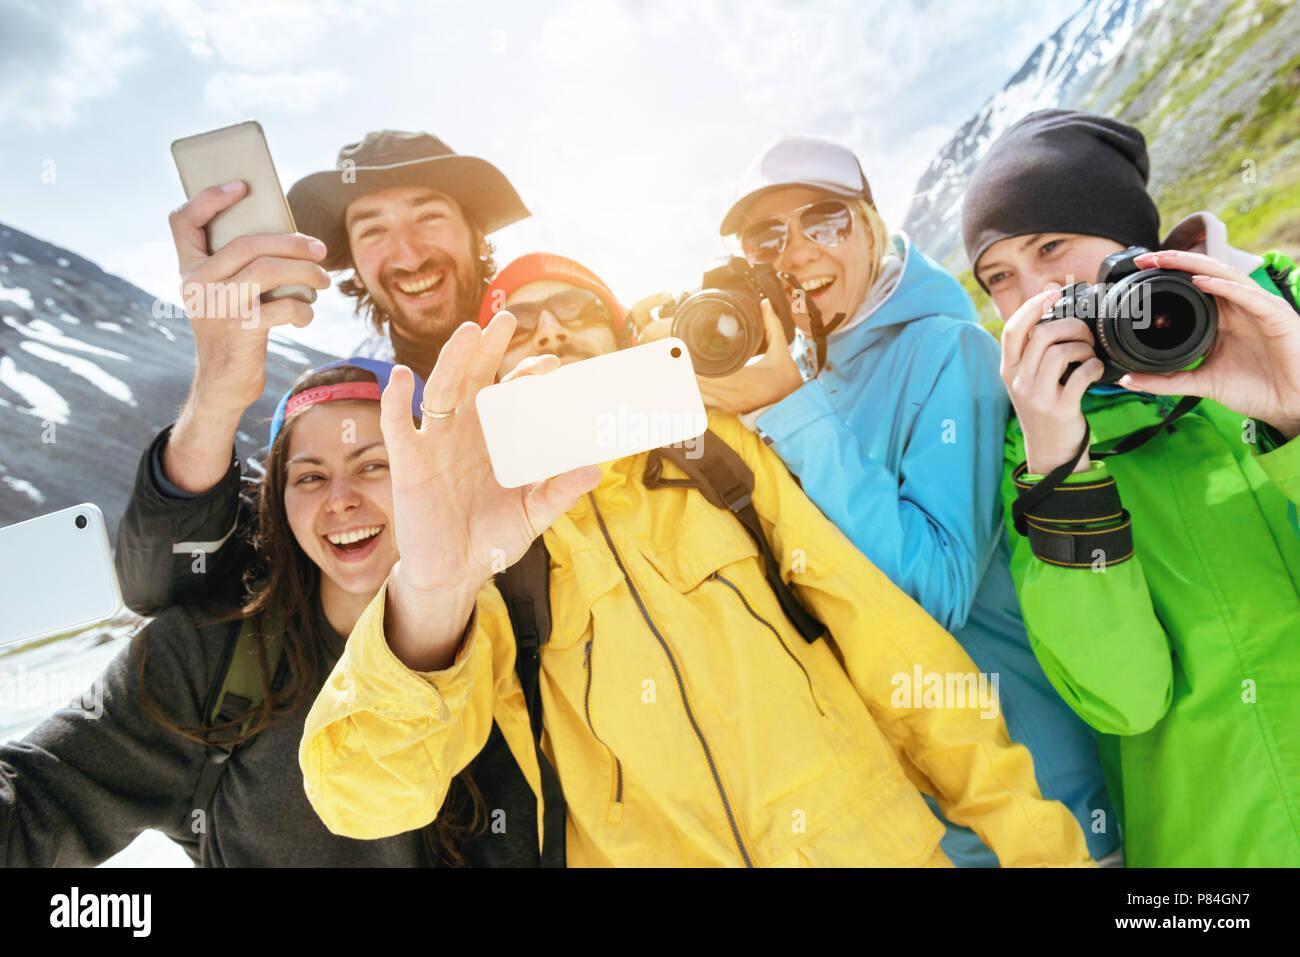 Group happy friends tourists photo selfie - Stock Image